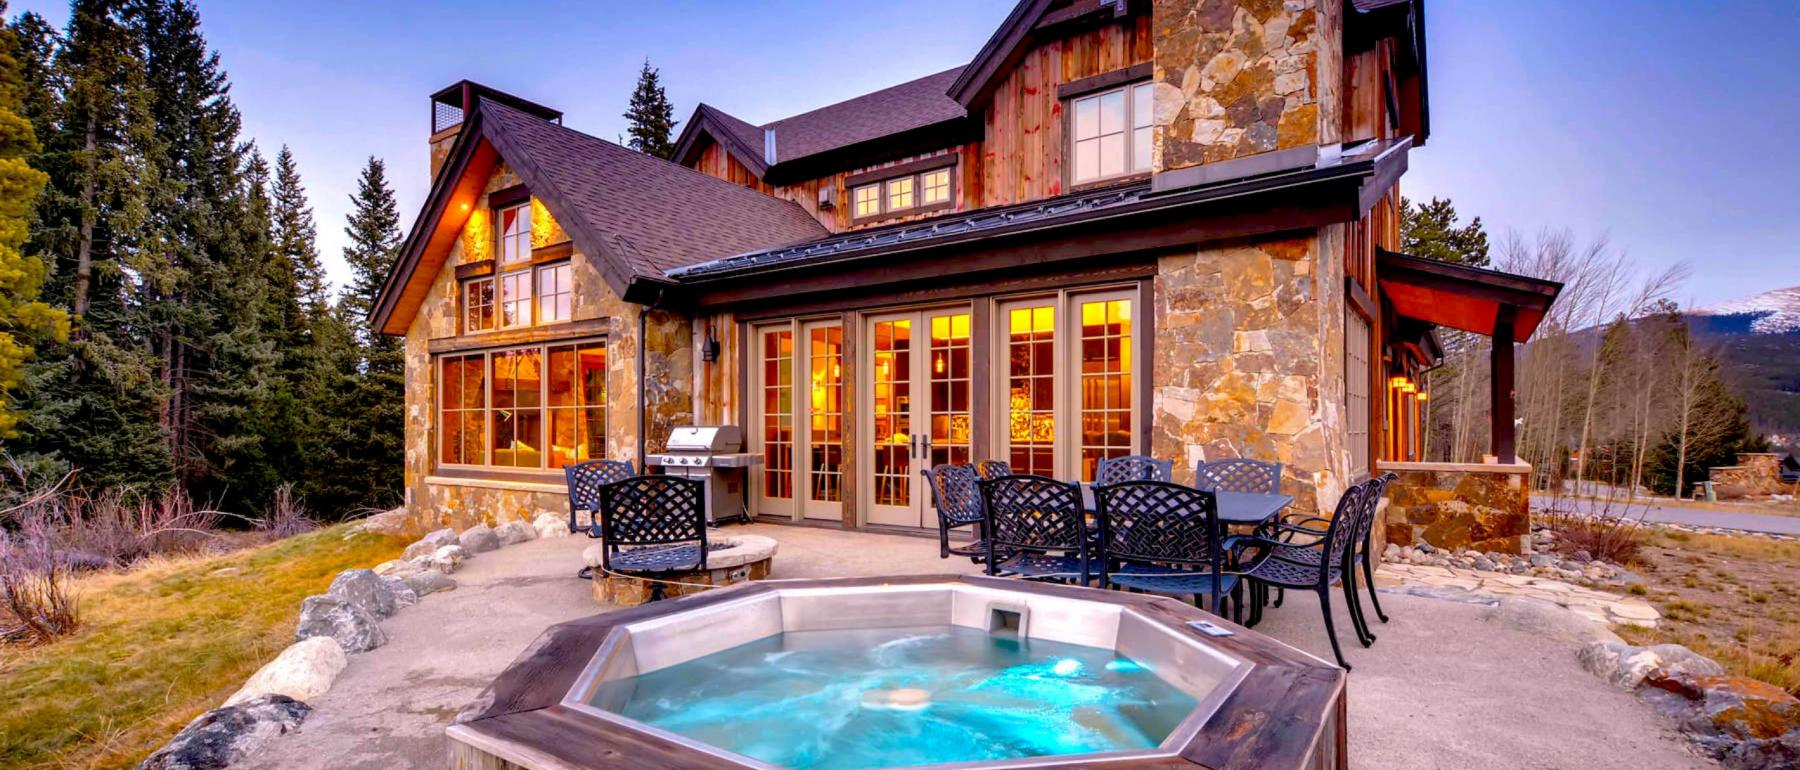 Legado Lodge